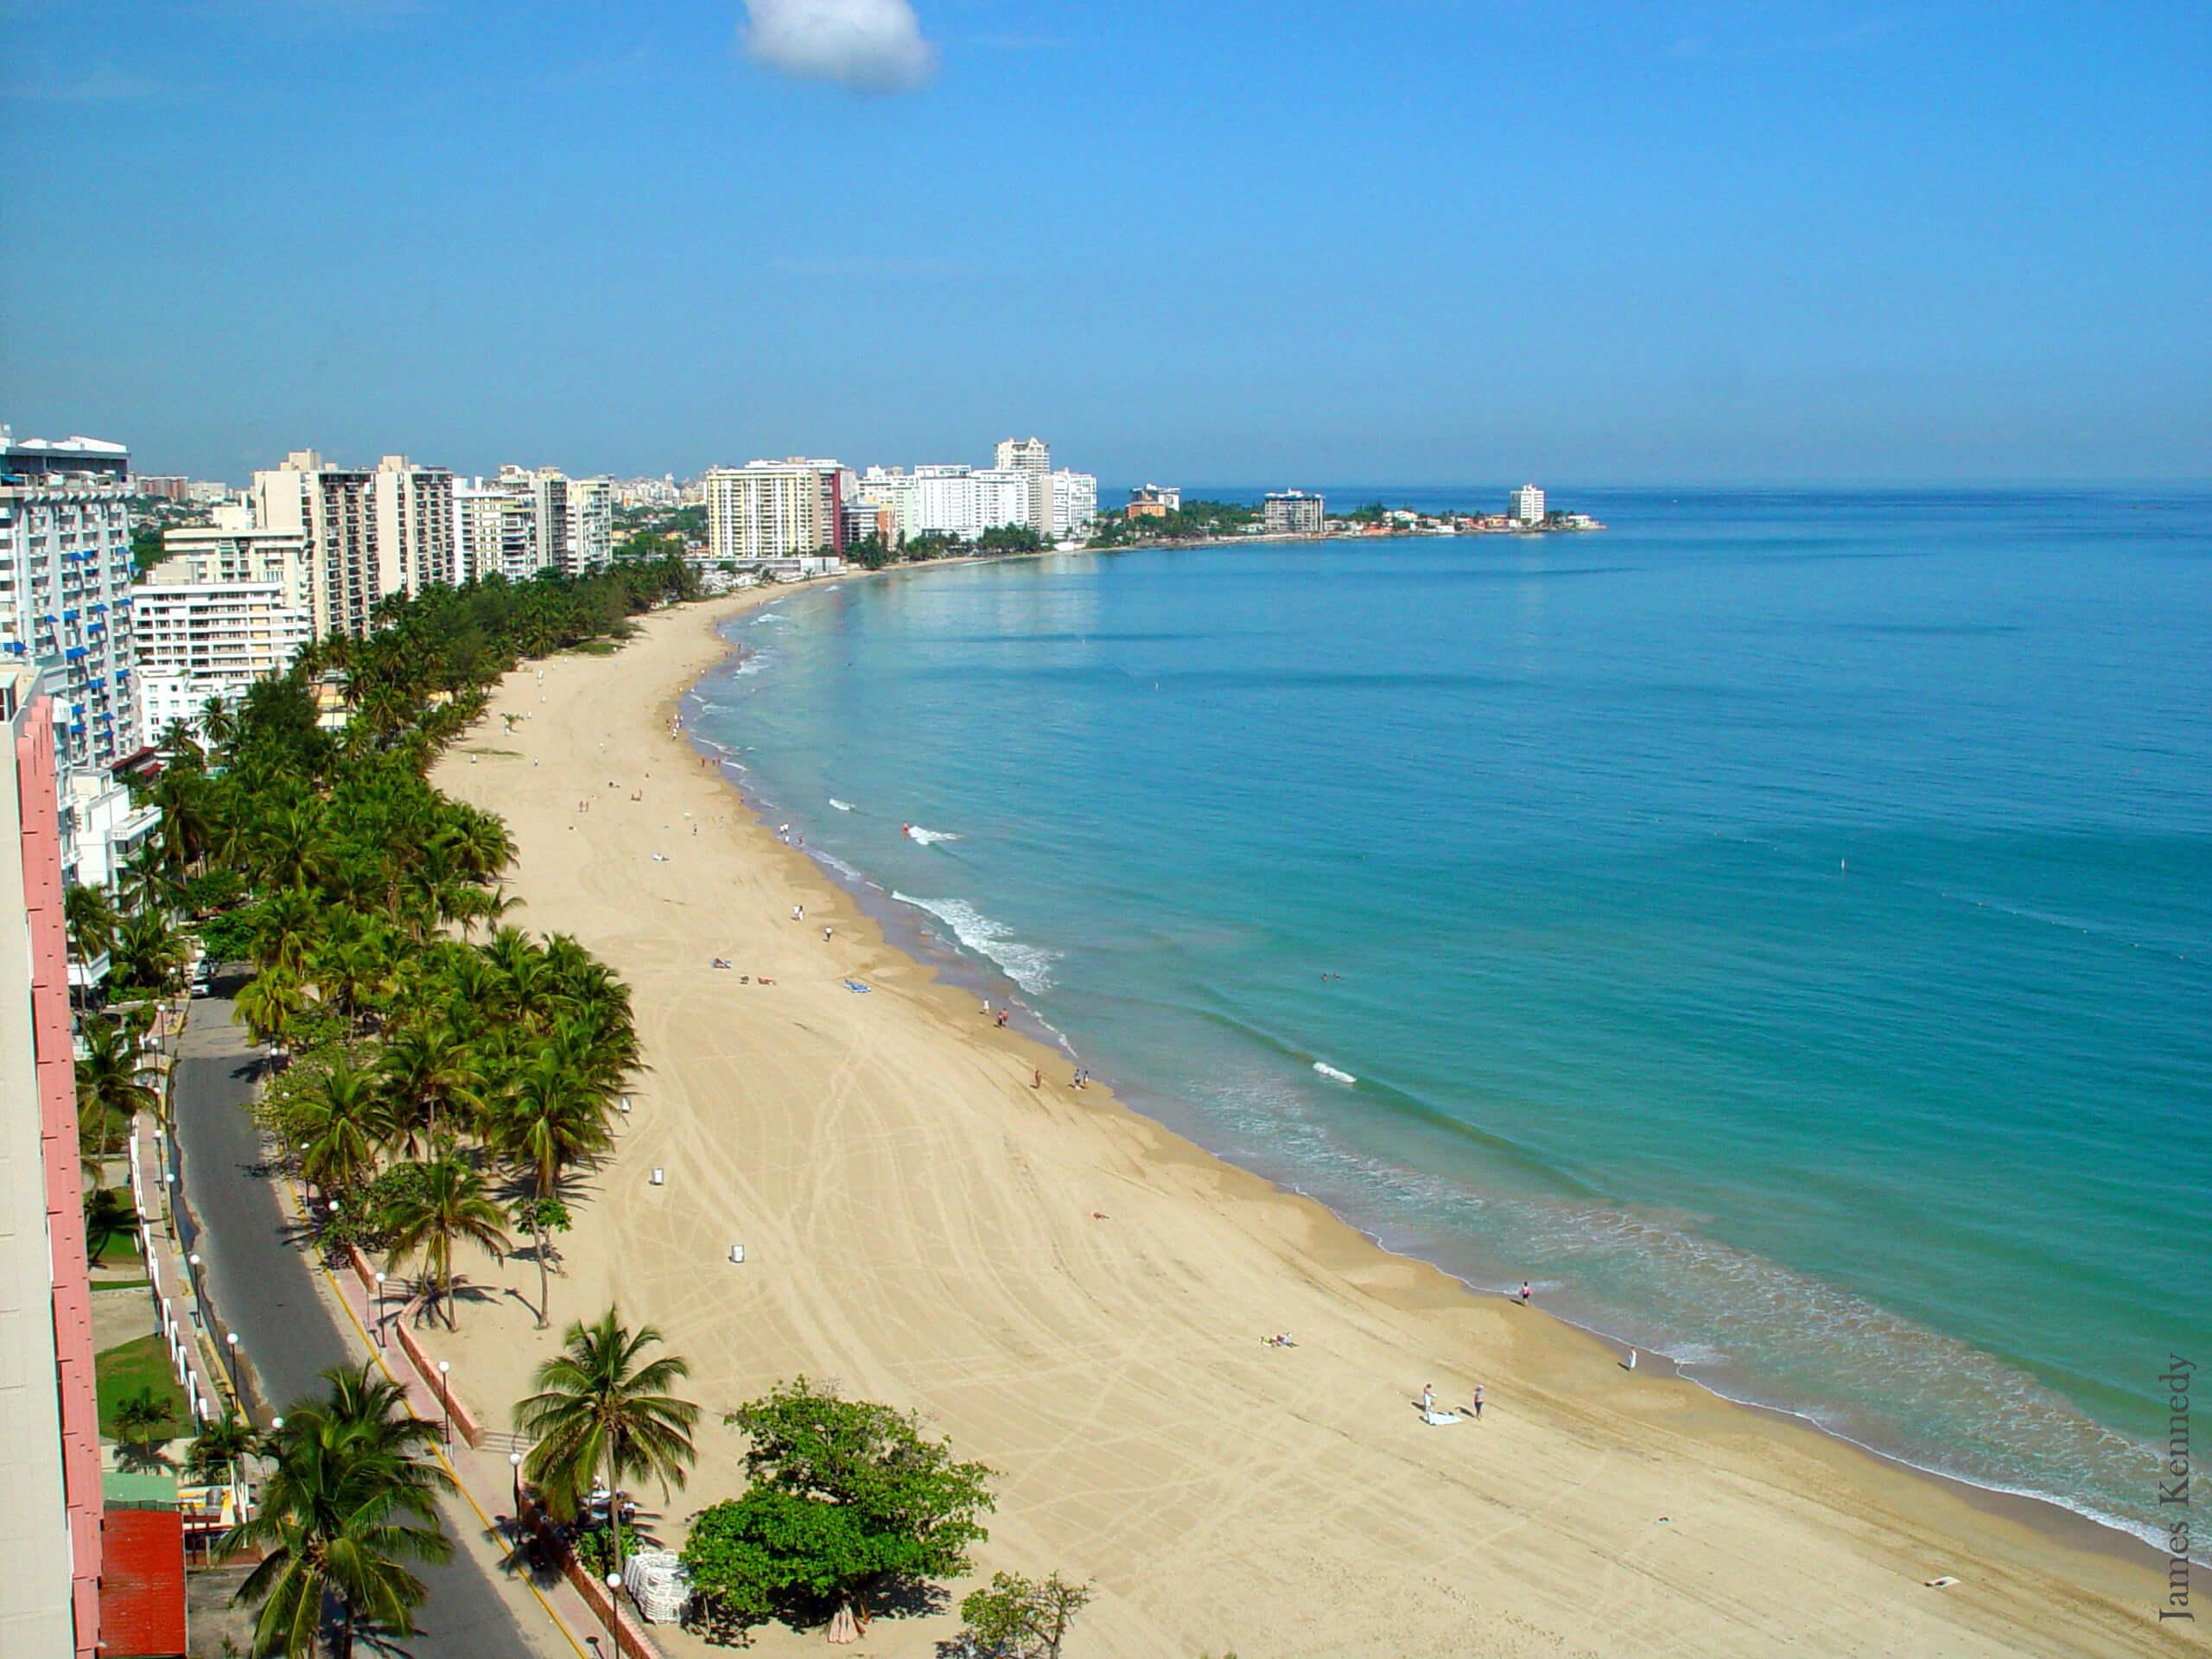 Puerto Rico, Isla Verde